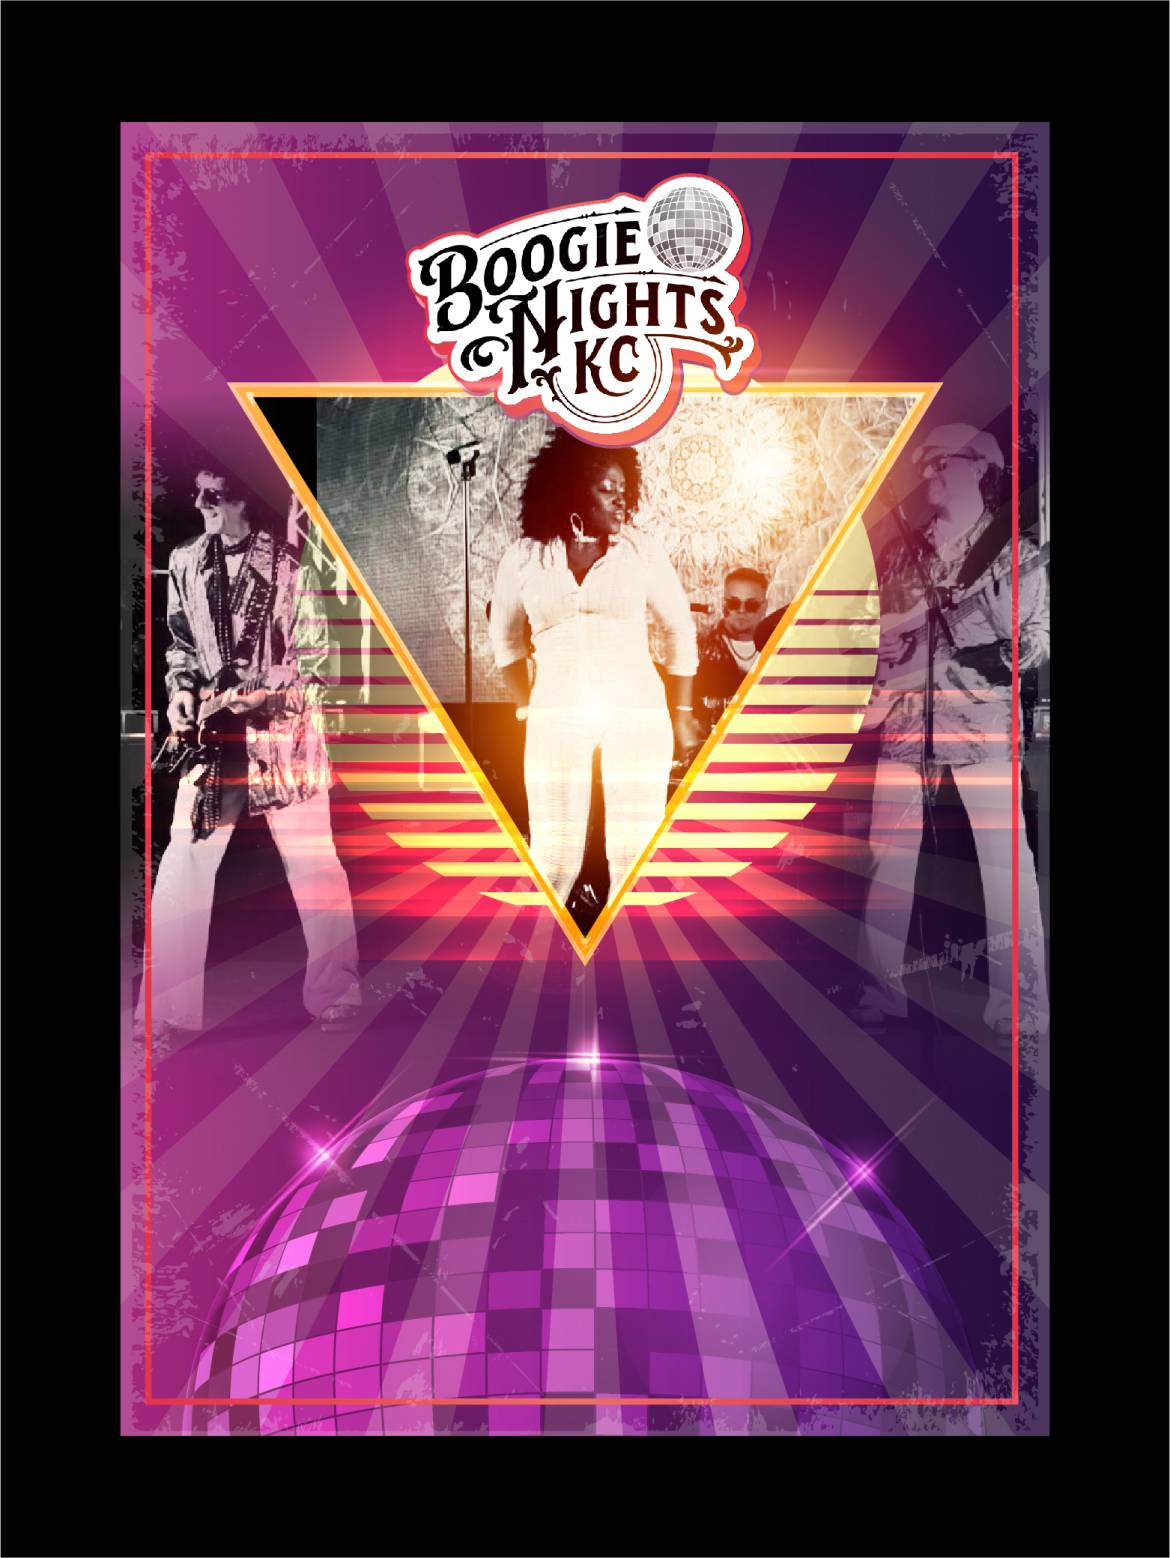 Boogie-Nights-KC-Poster-02.jpg